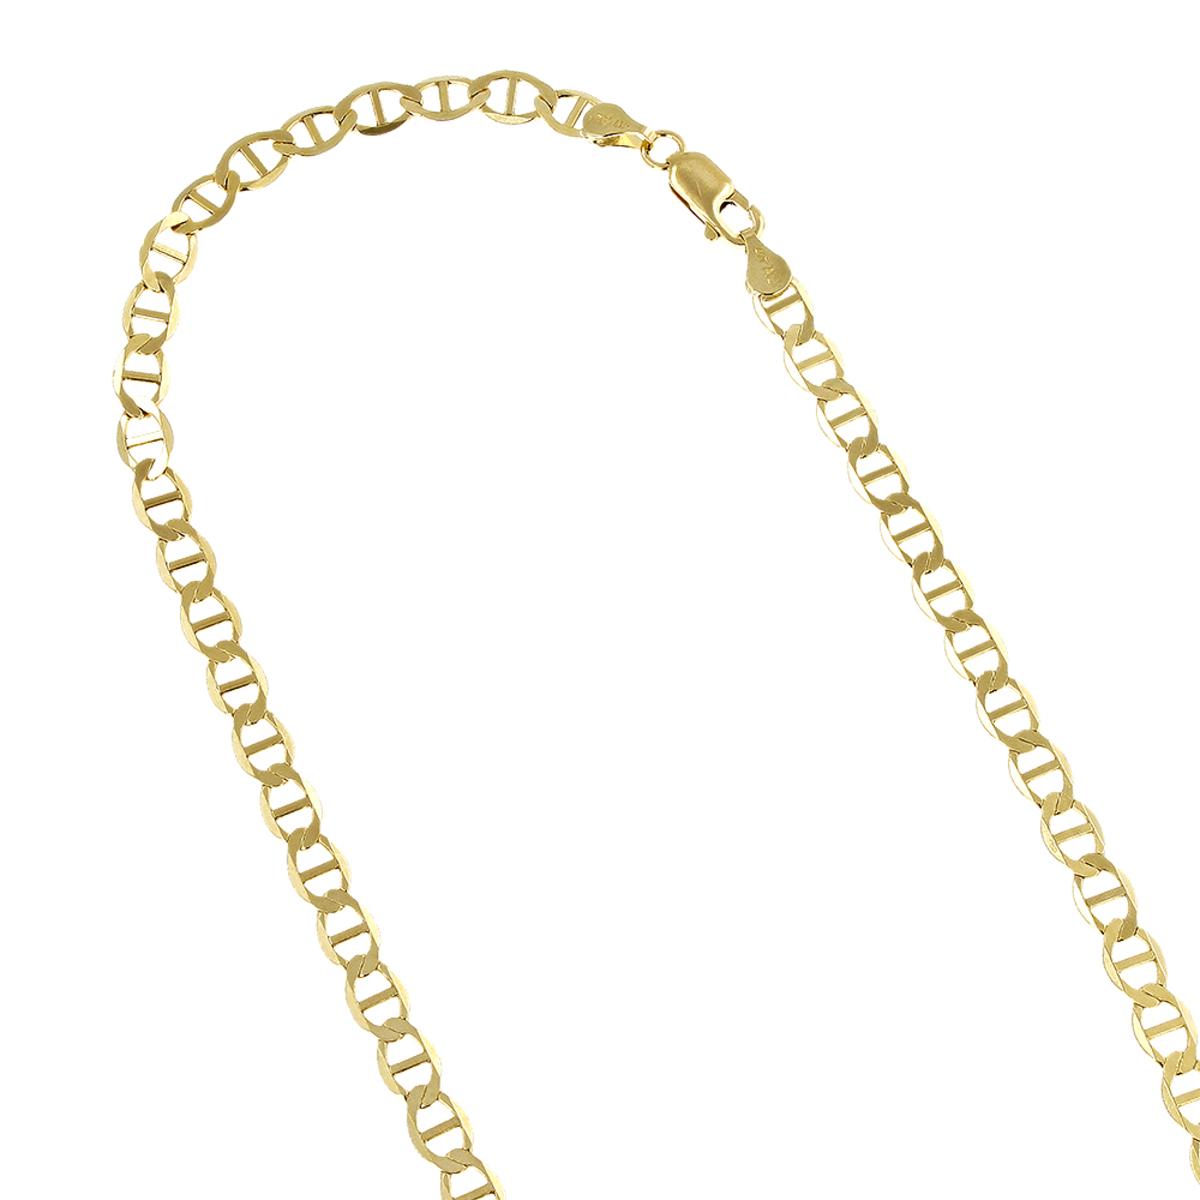 LUXURMAN Solid 14k Gold Mariner Chain For Men & Women 4.5mm Wide